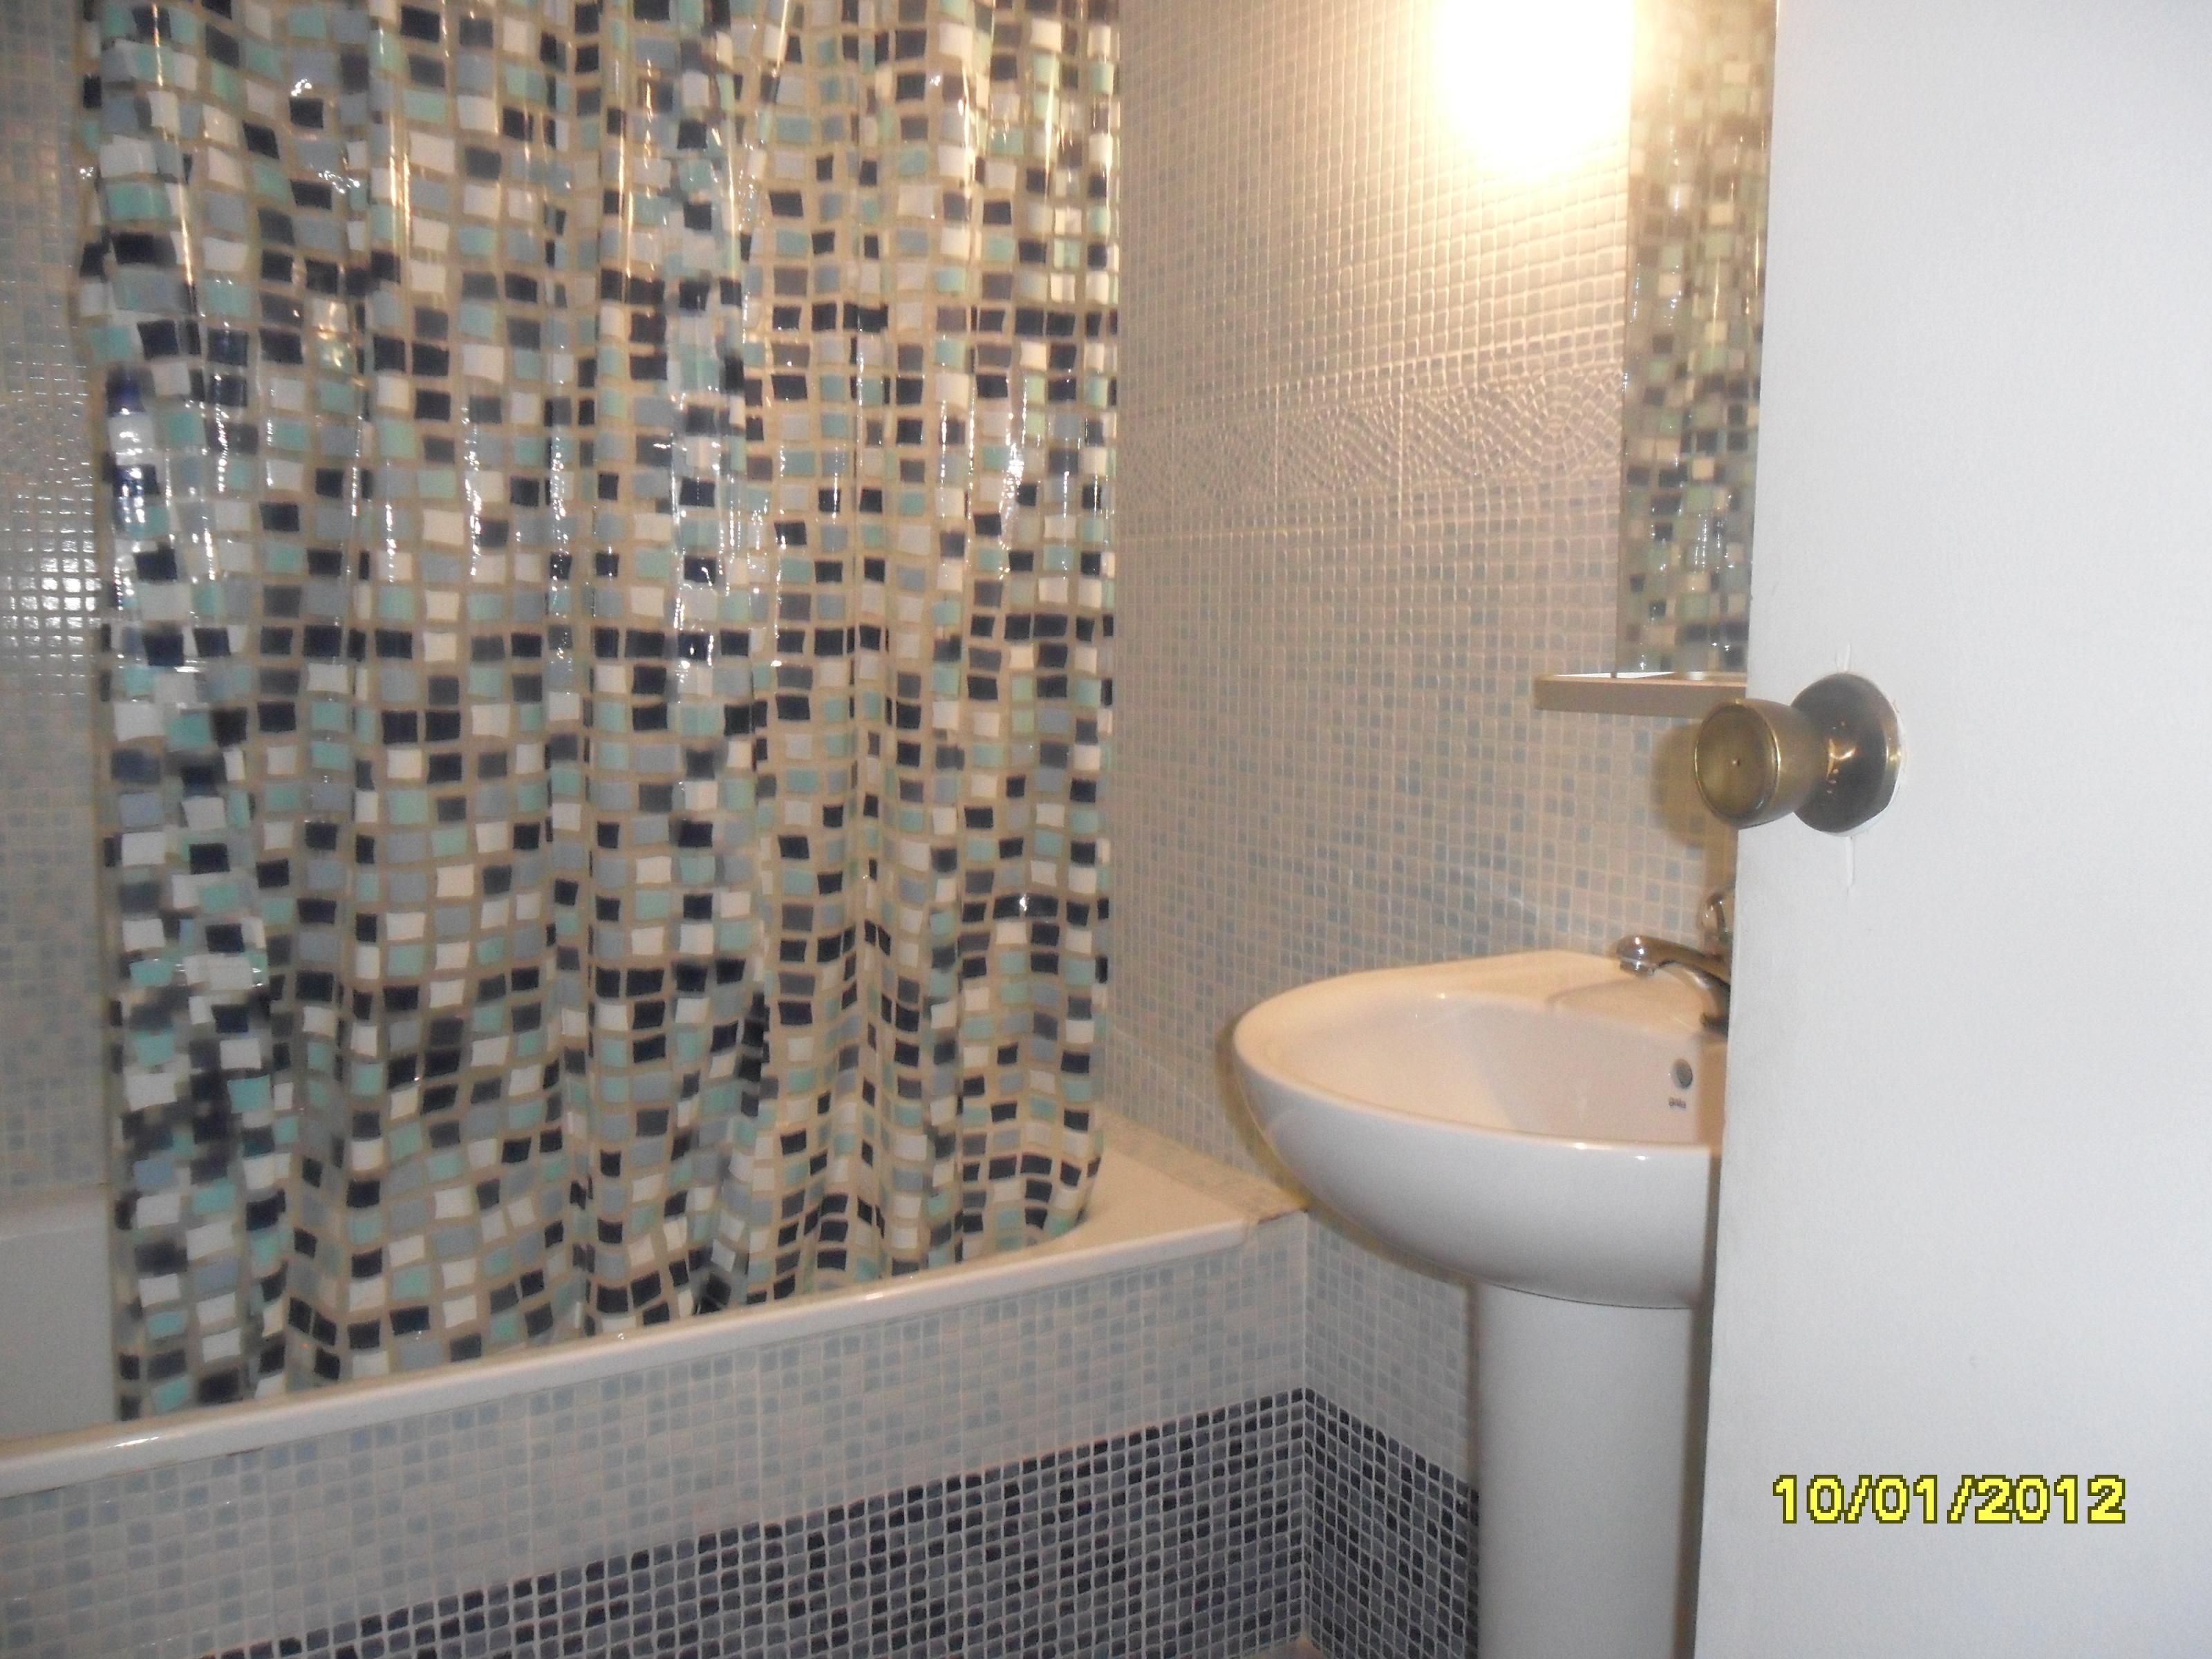 Alquiler de piso en correduria 27 alameda sevilla for Alquiler de particulares en sevilla